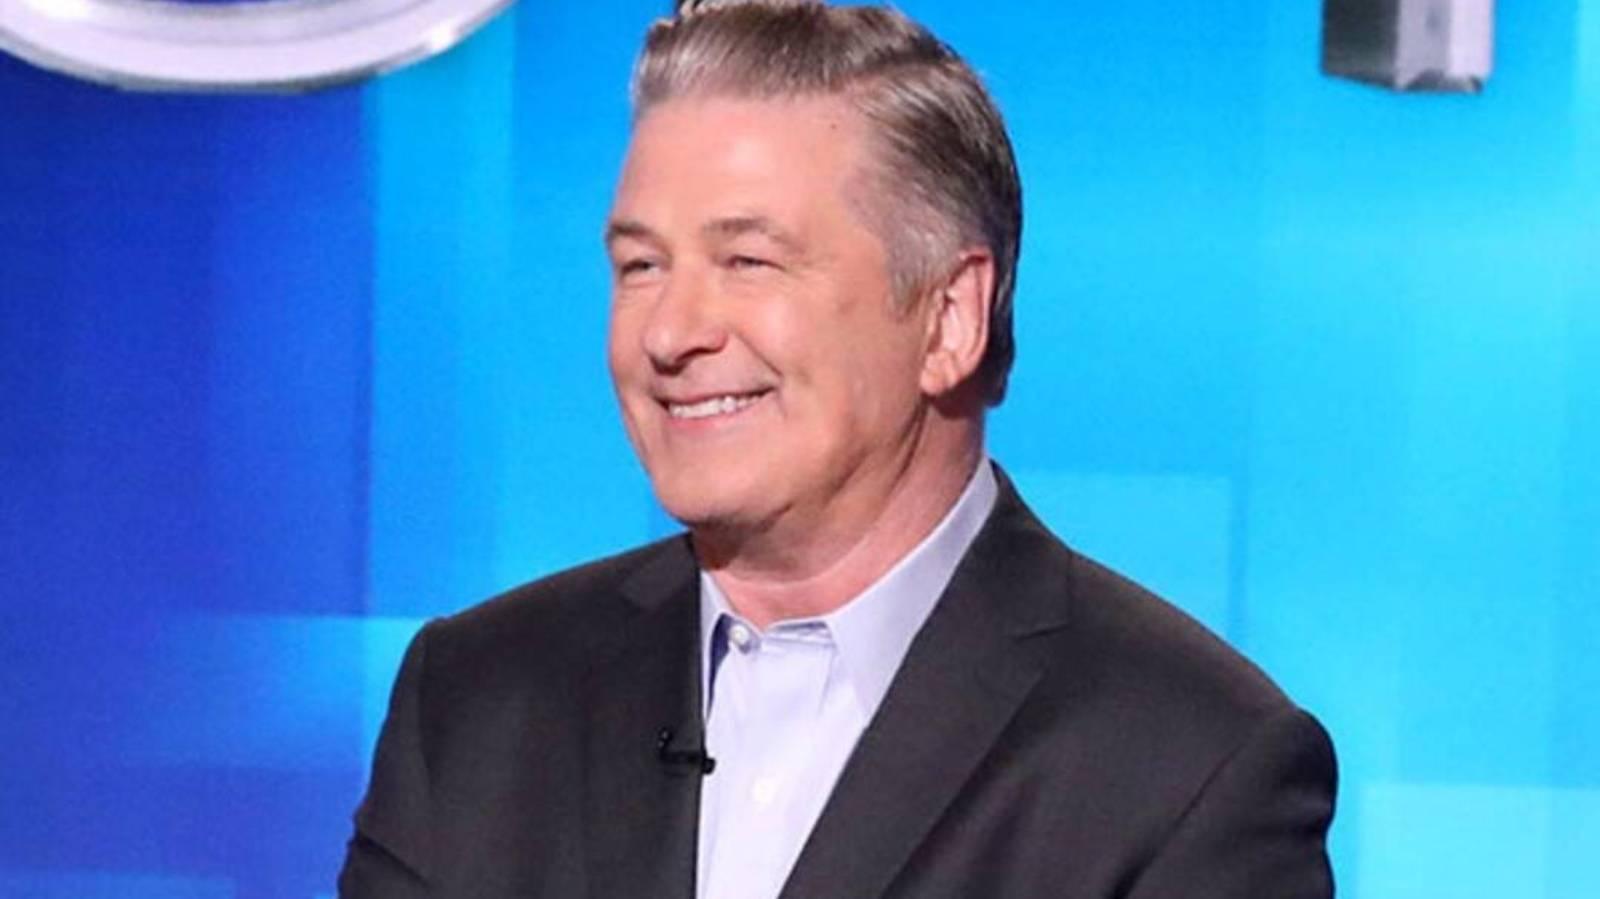 Ellen's first guest since 'toxic' allegations is Alec Baldwin